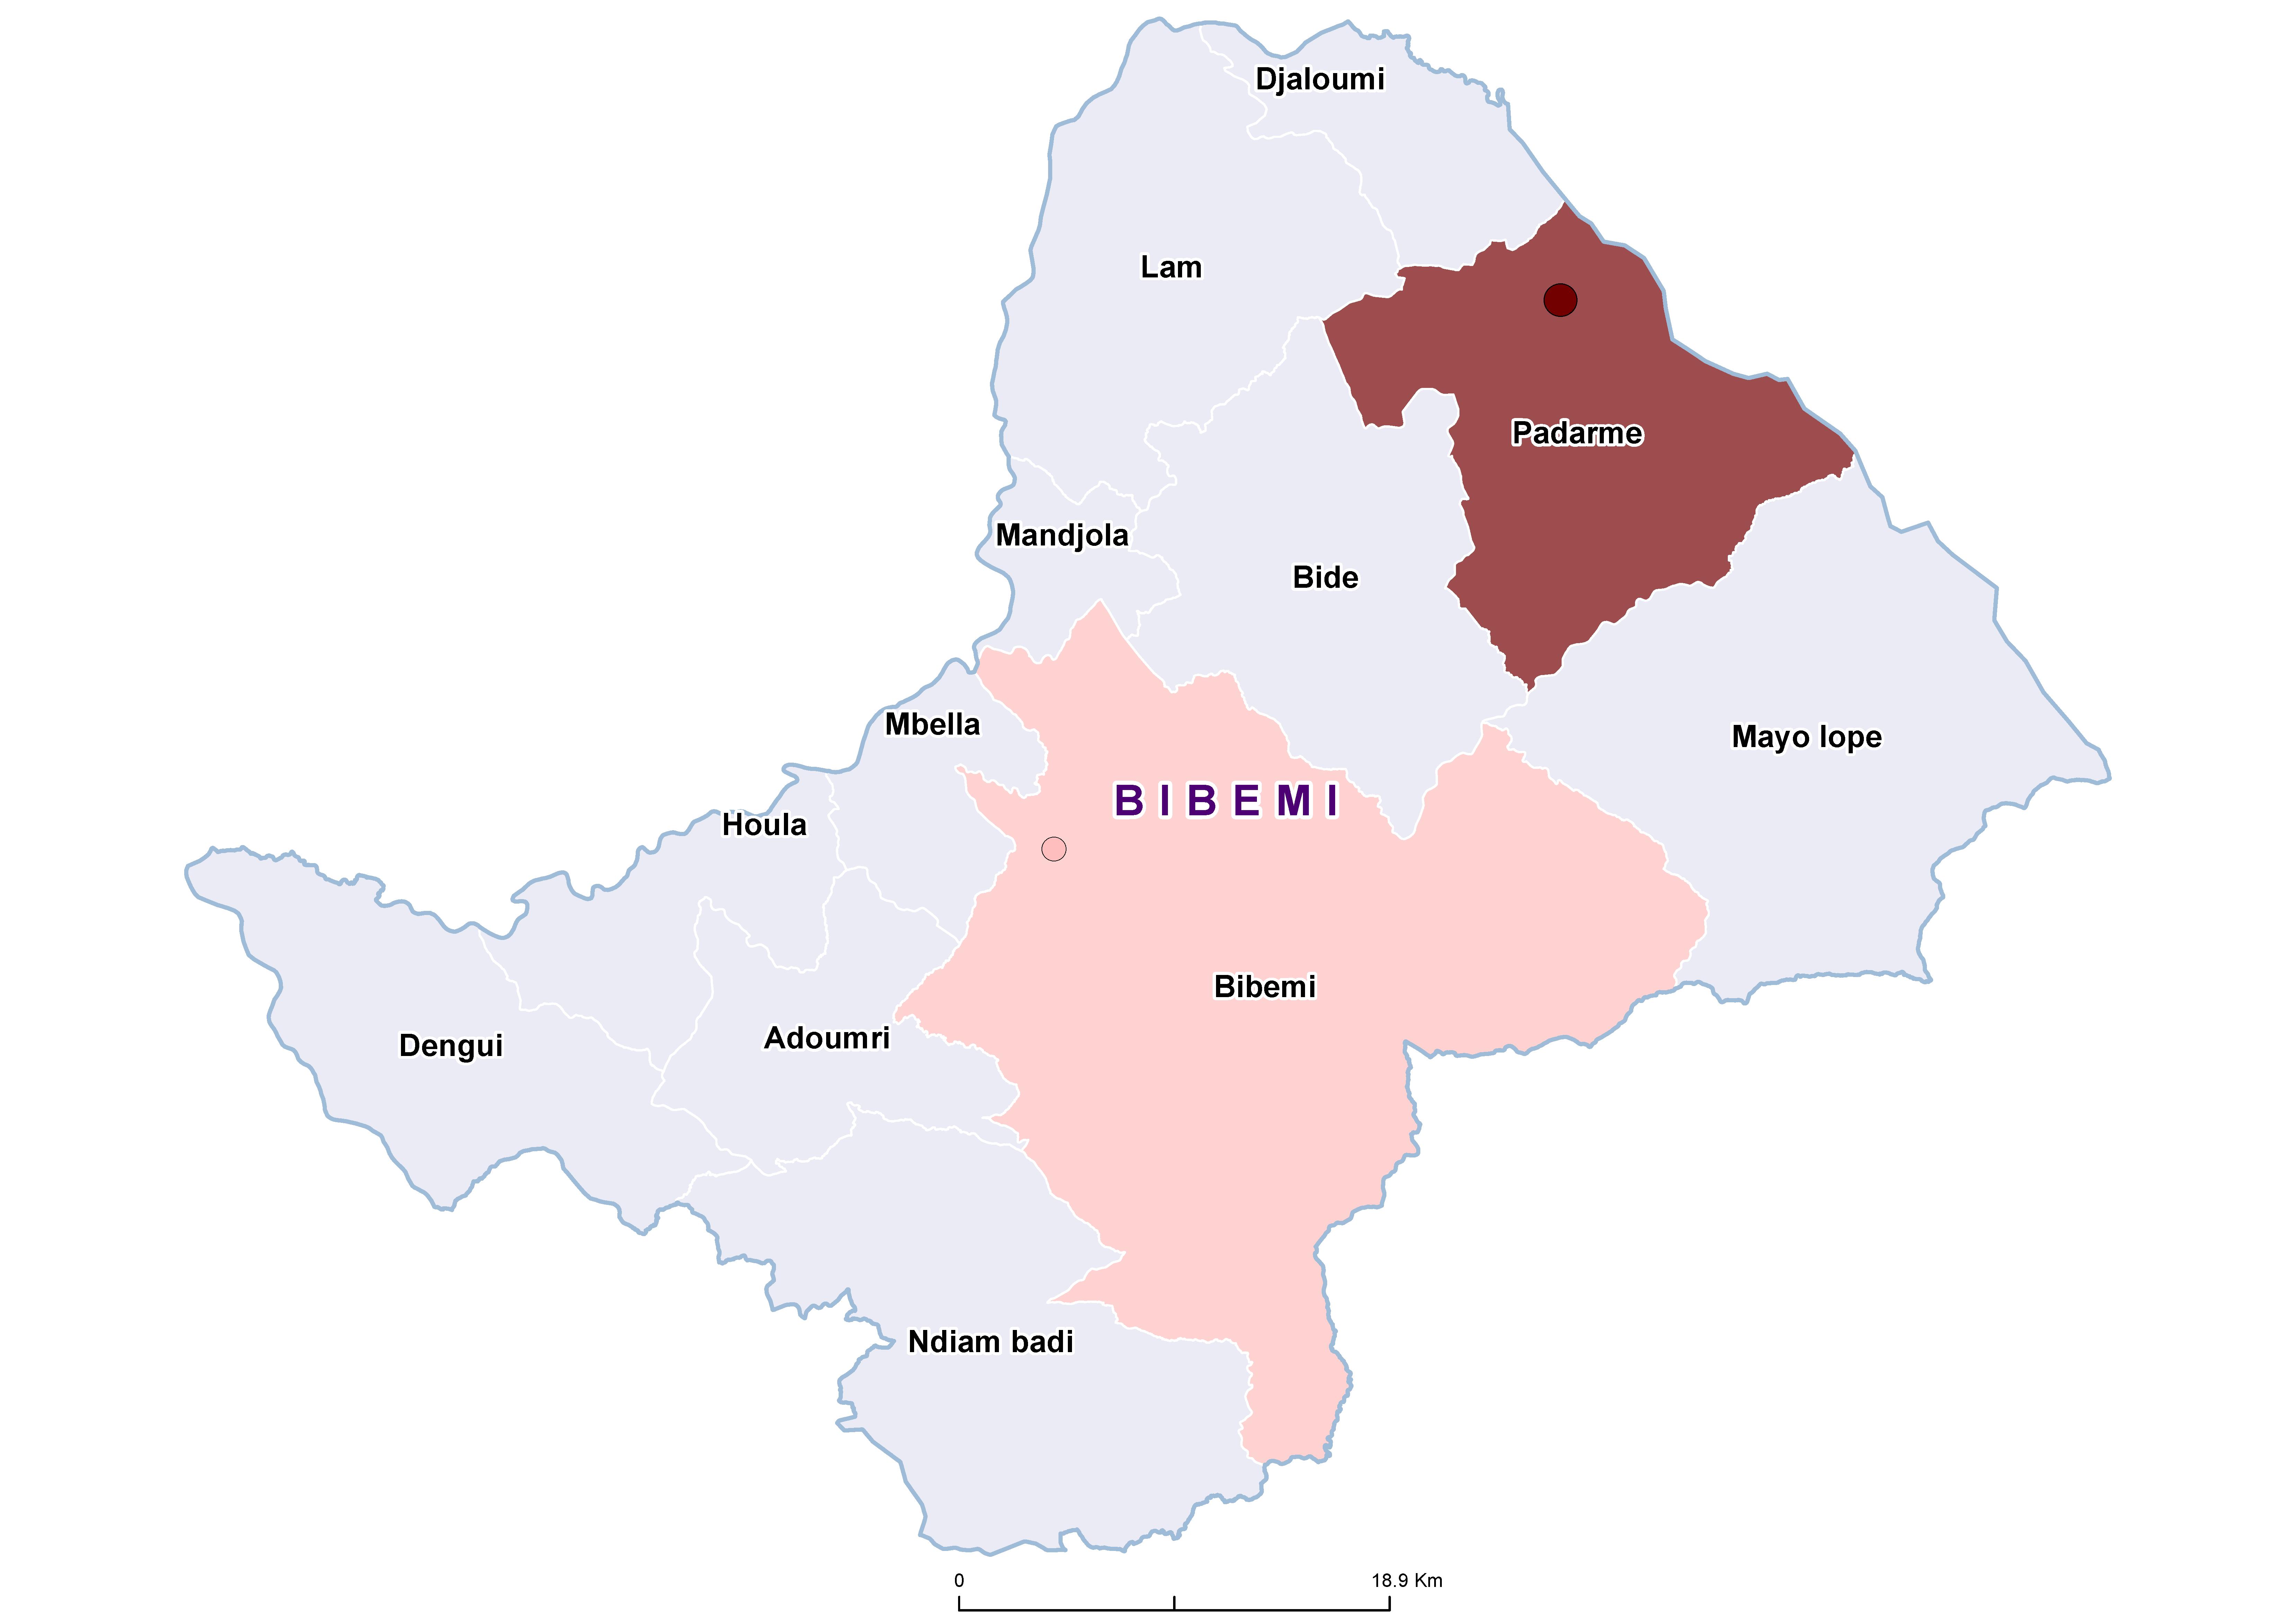 Bibemi SCH 19850001